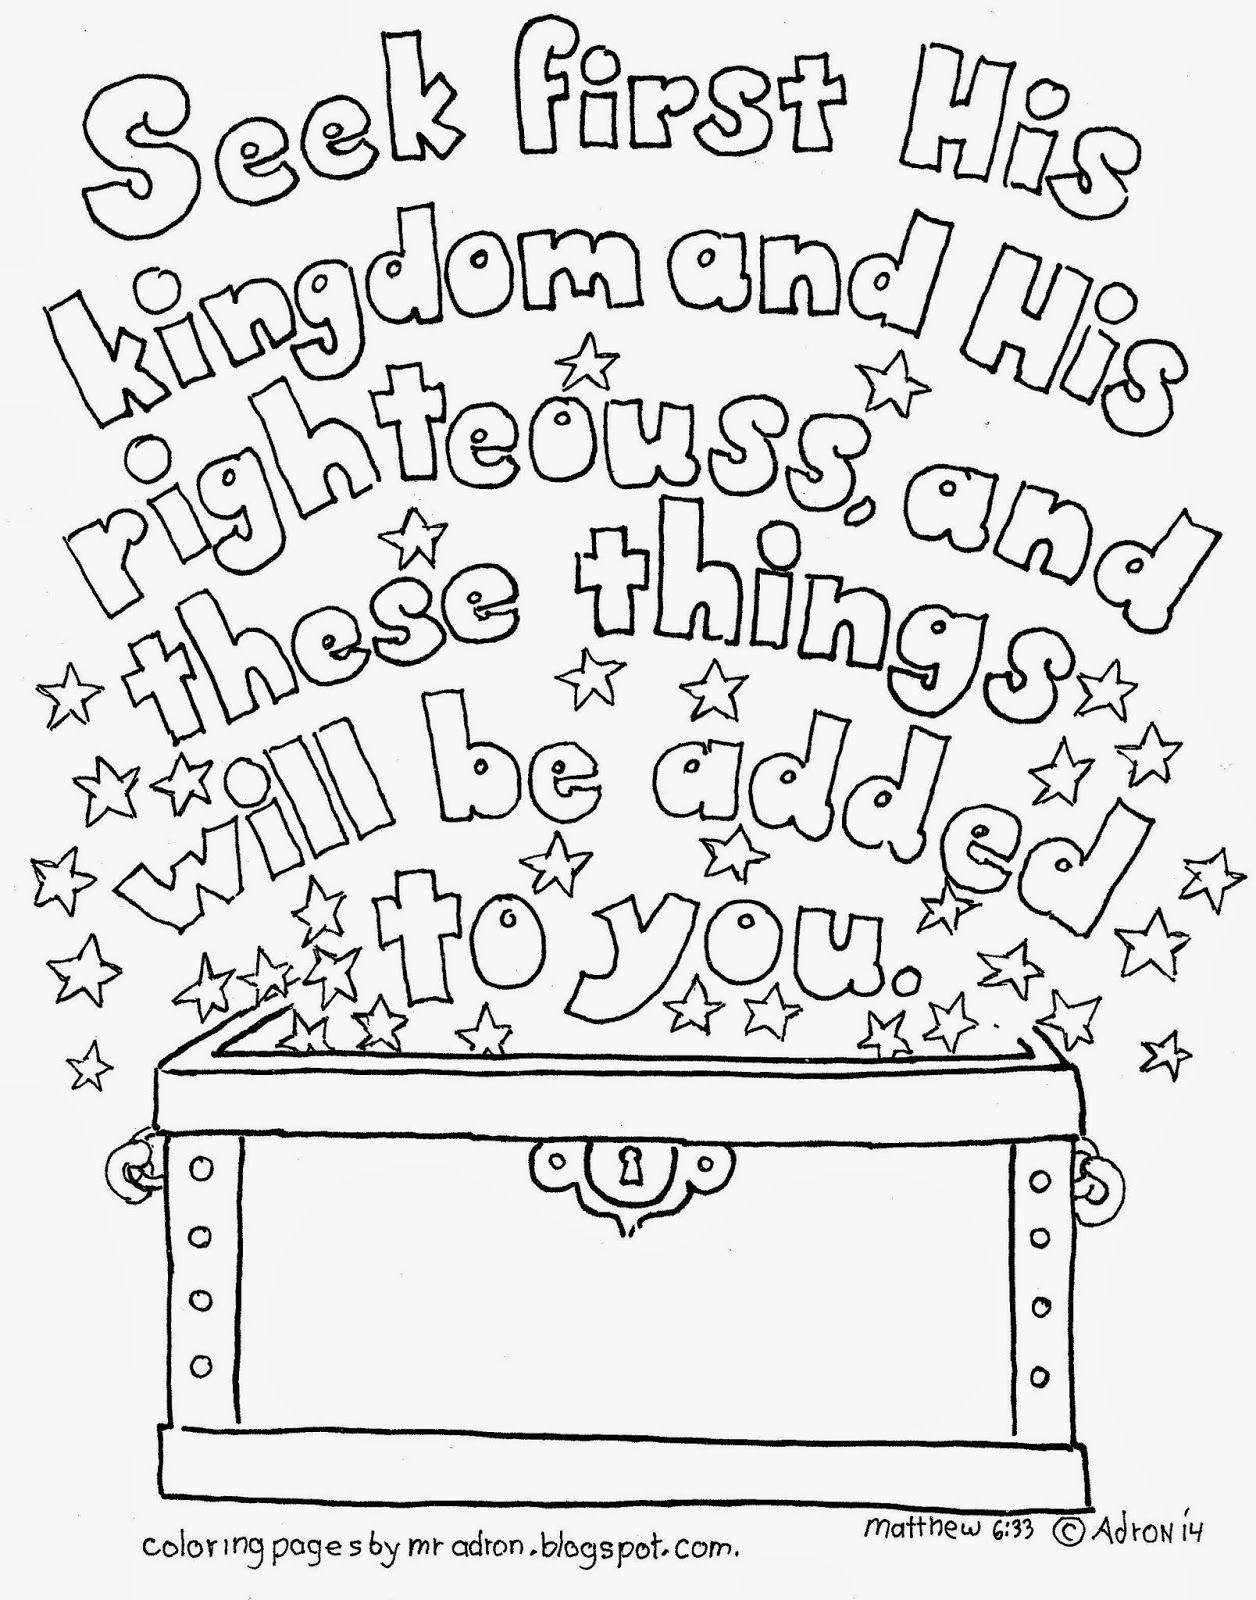 Free Scripture Doodles 3 Gospels With Images